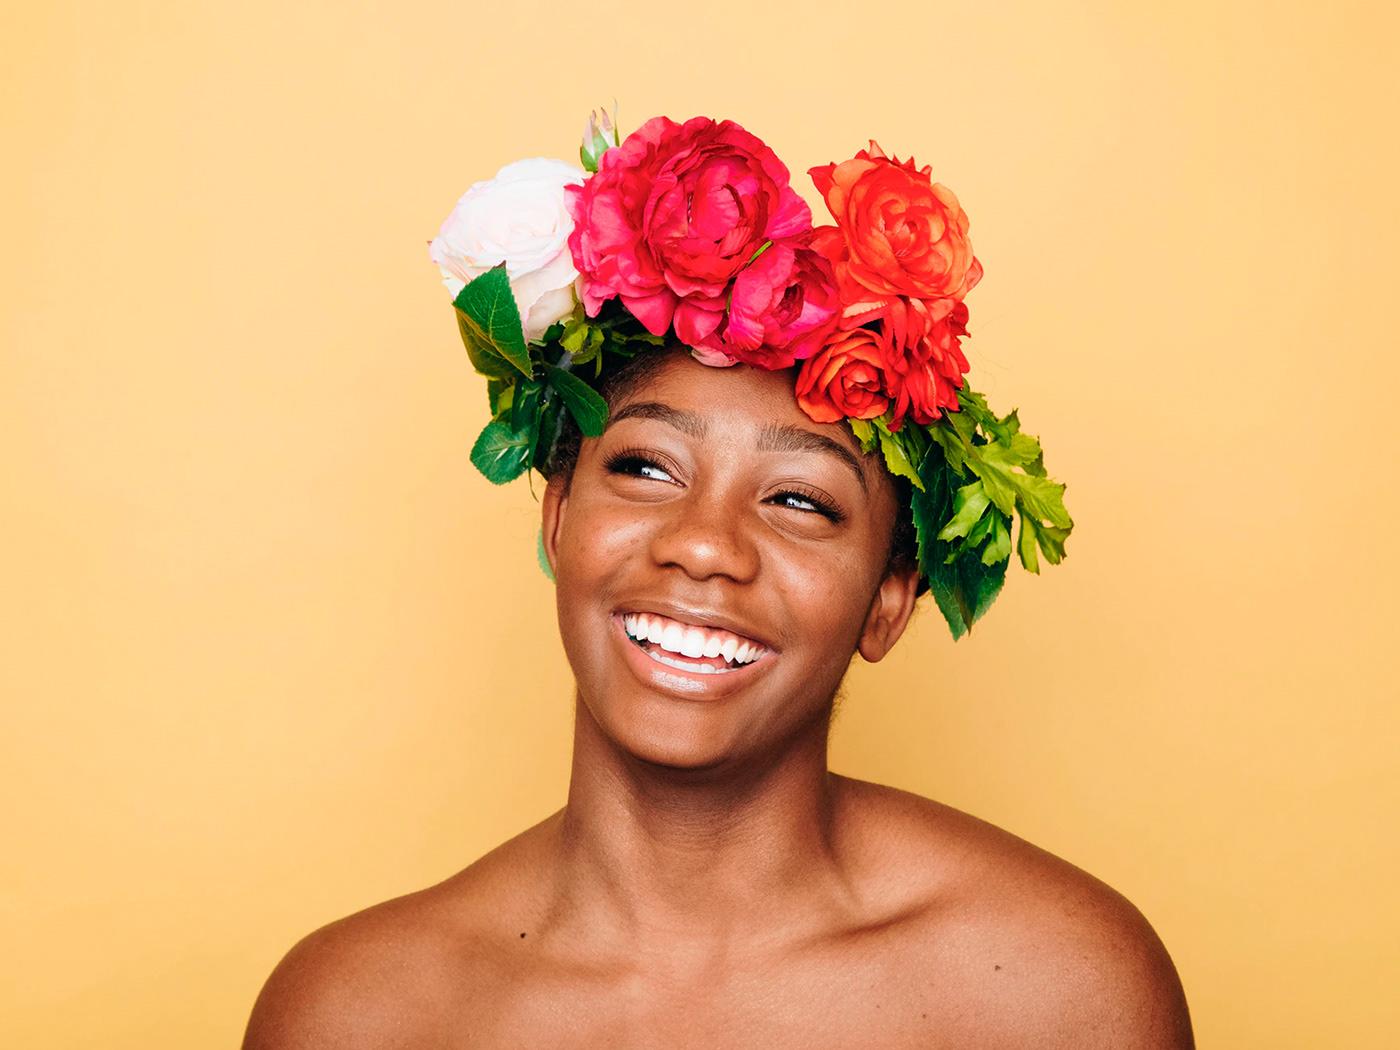 Beautiful black woman smiling with no makeup